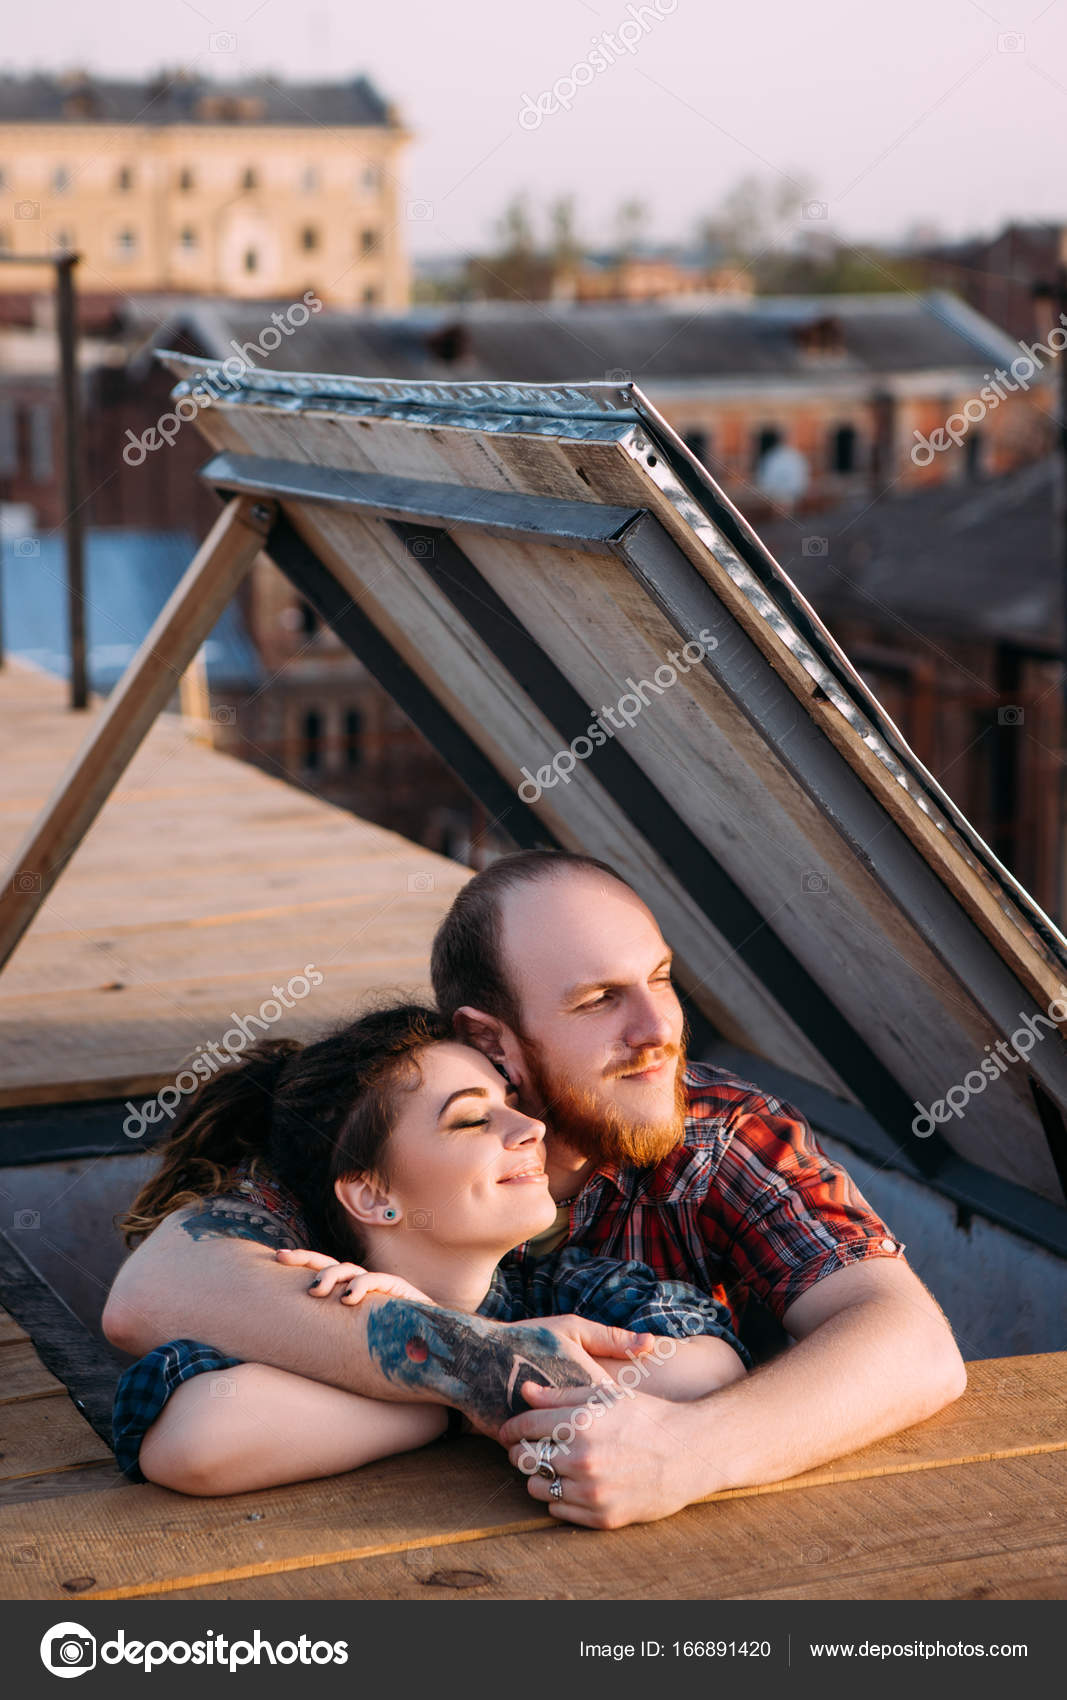 Dating ρομαντική τοποθεσία τραγούδι Ji Χιο ραντεβού Διευθύνων Σύμβουλος